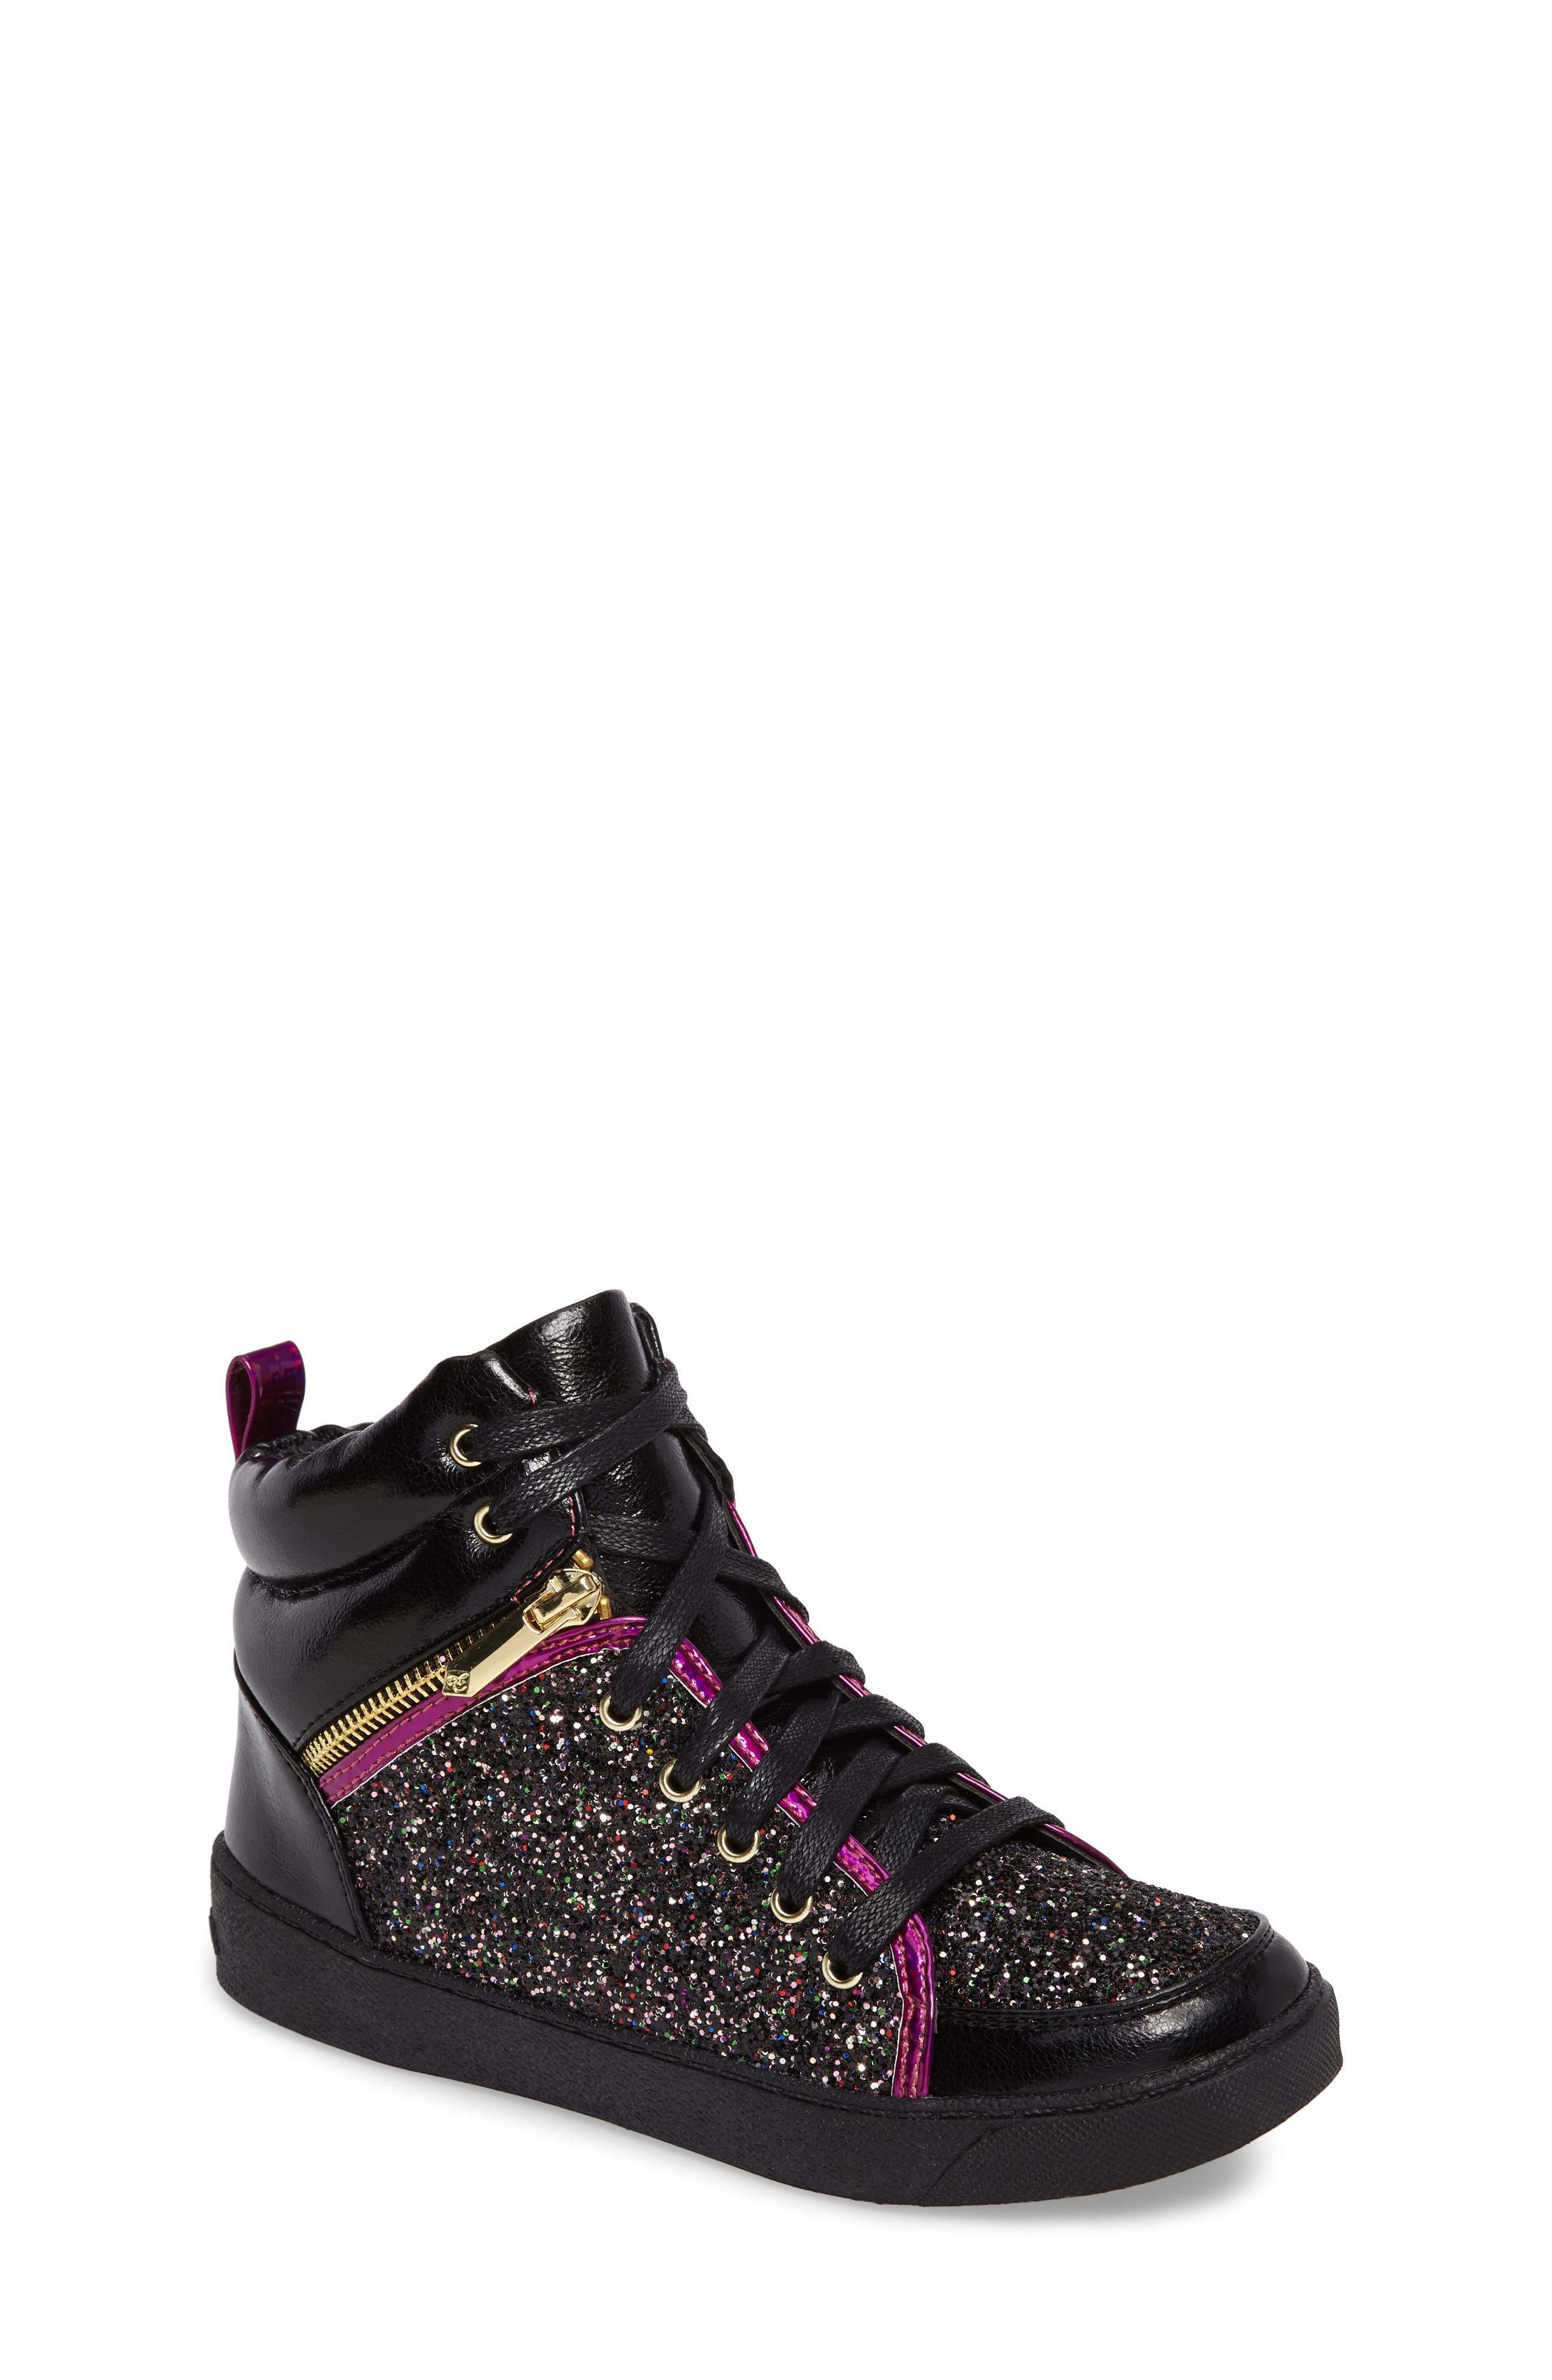 Sam Edelman Britt Remy Glitter High Top Sneaker (Toddler, Little Kid & Big Kid)